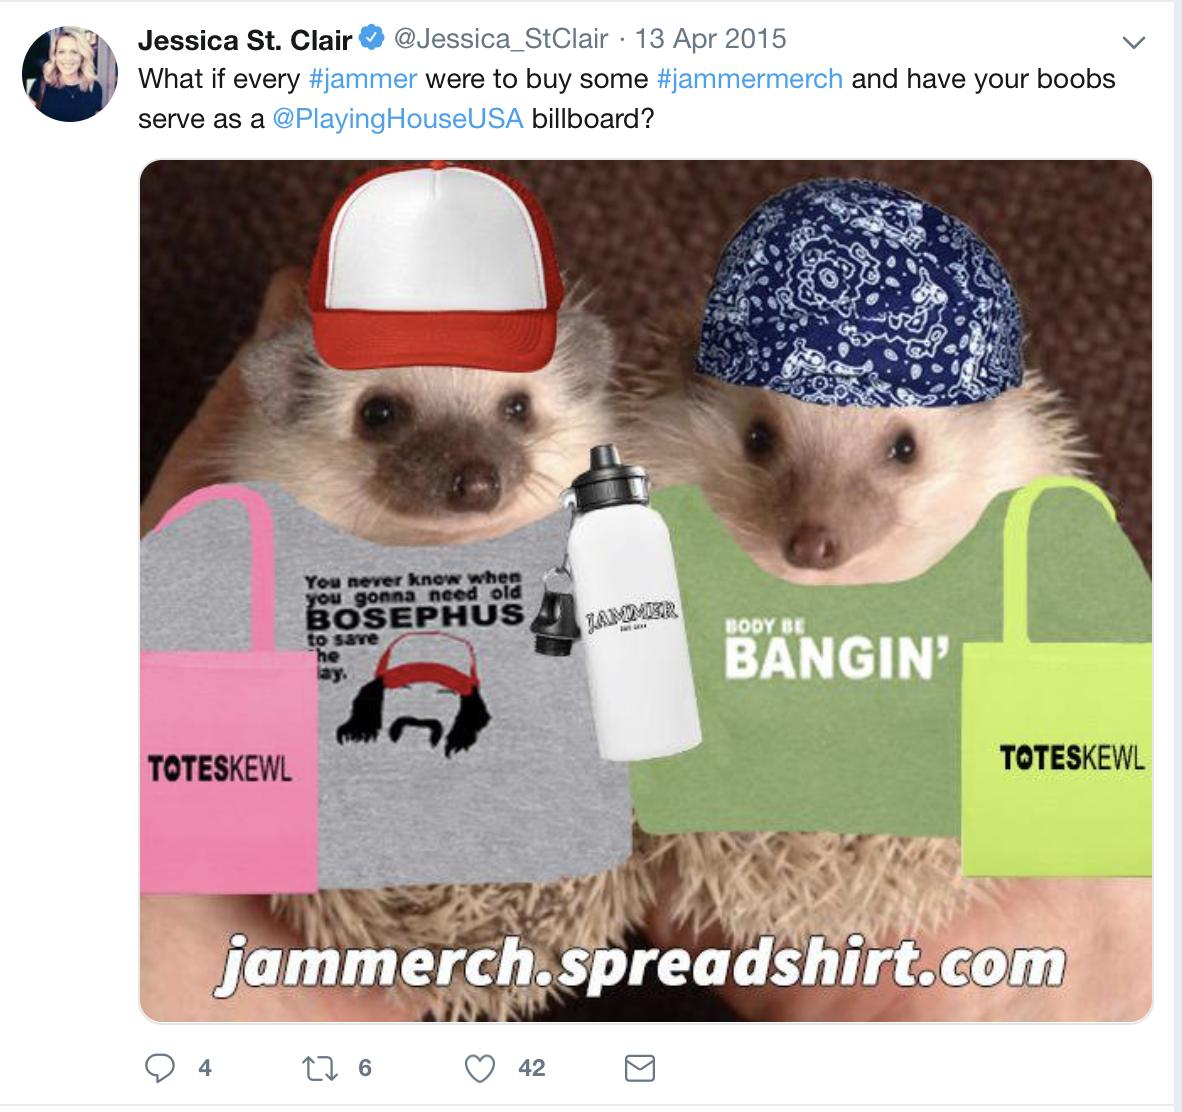 Screenshot of Jessica St. Clair's Twitter account